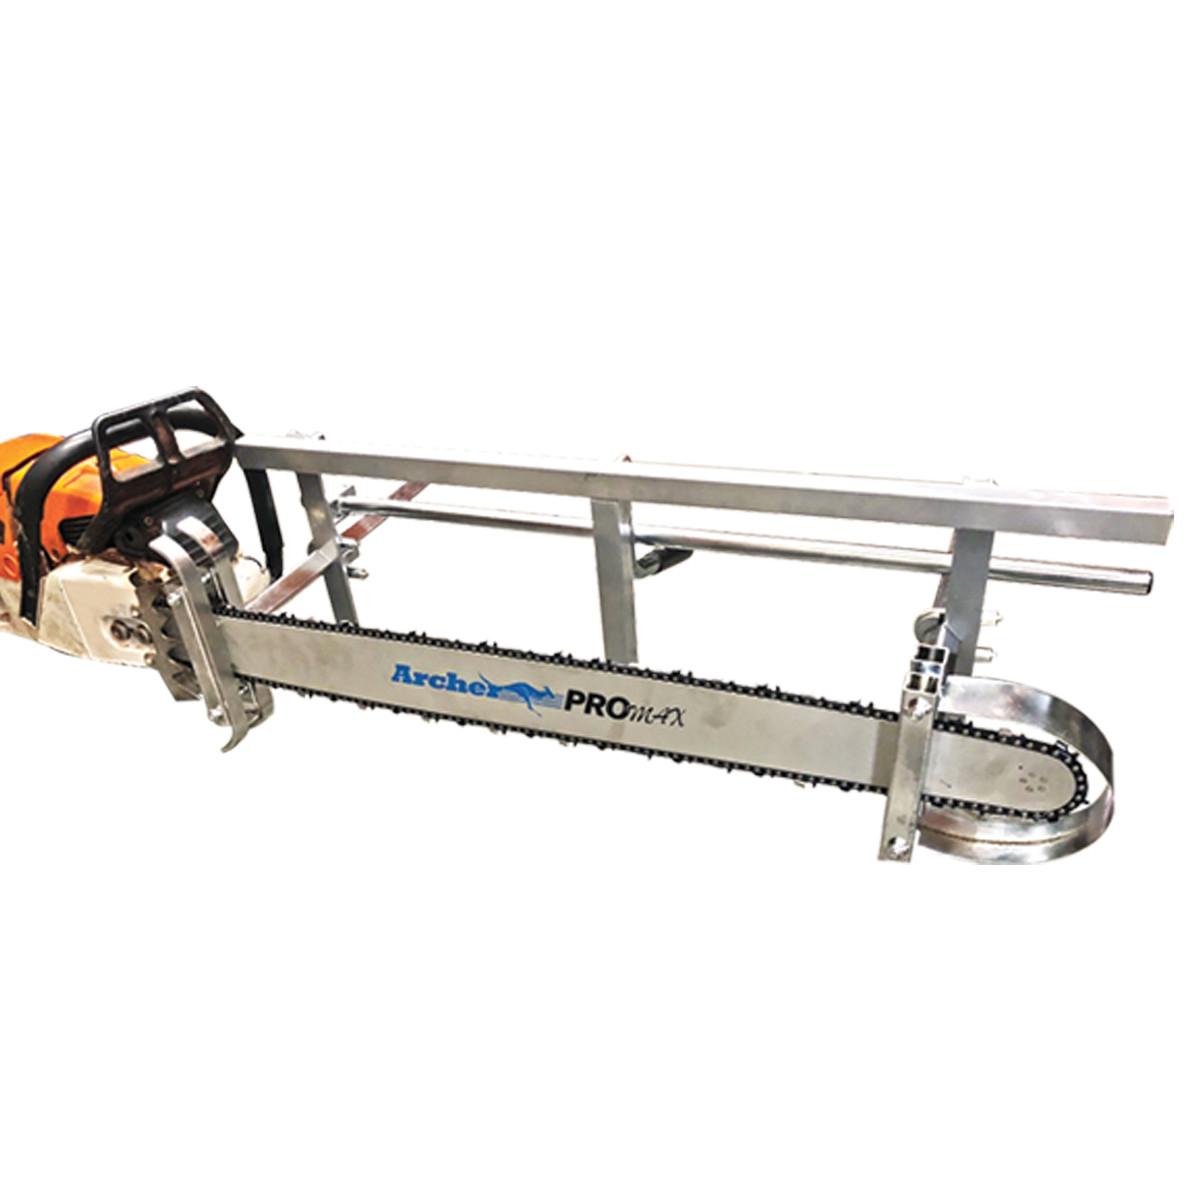 "Portable Chainsaw Mill 36"" Archer"